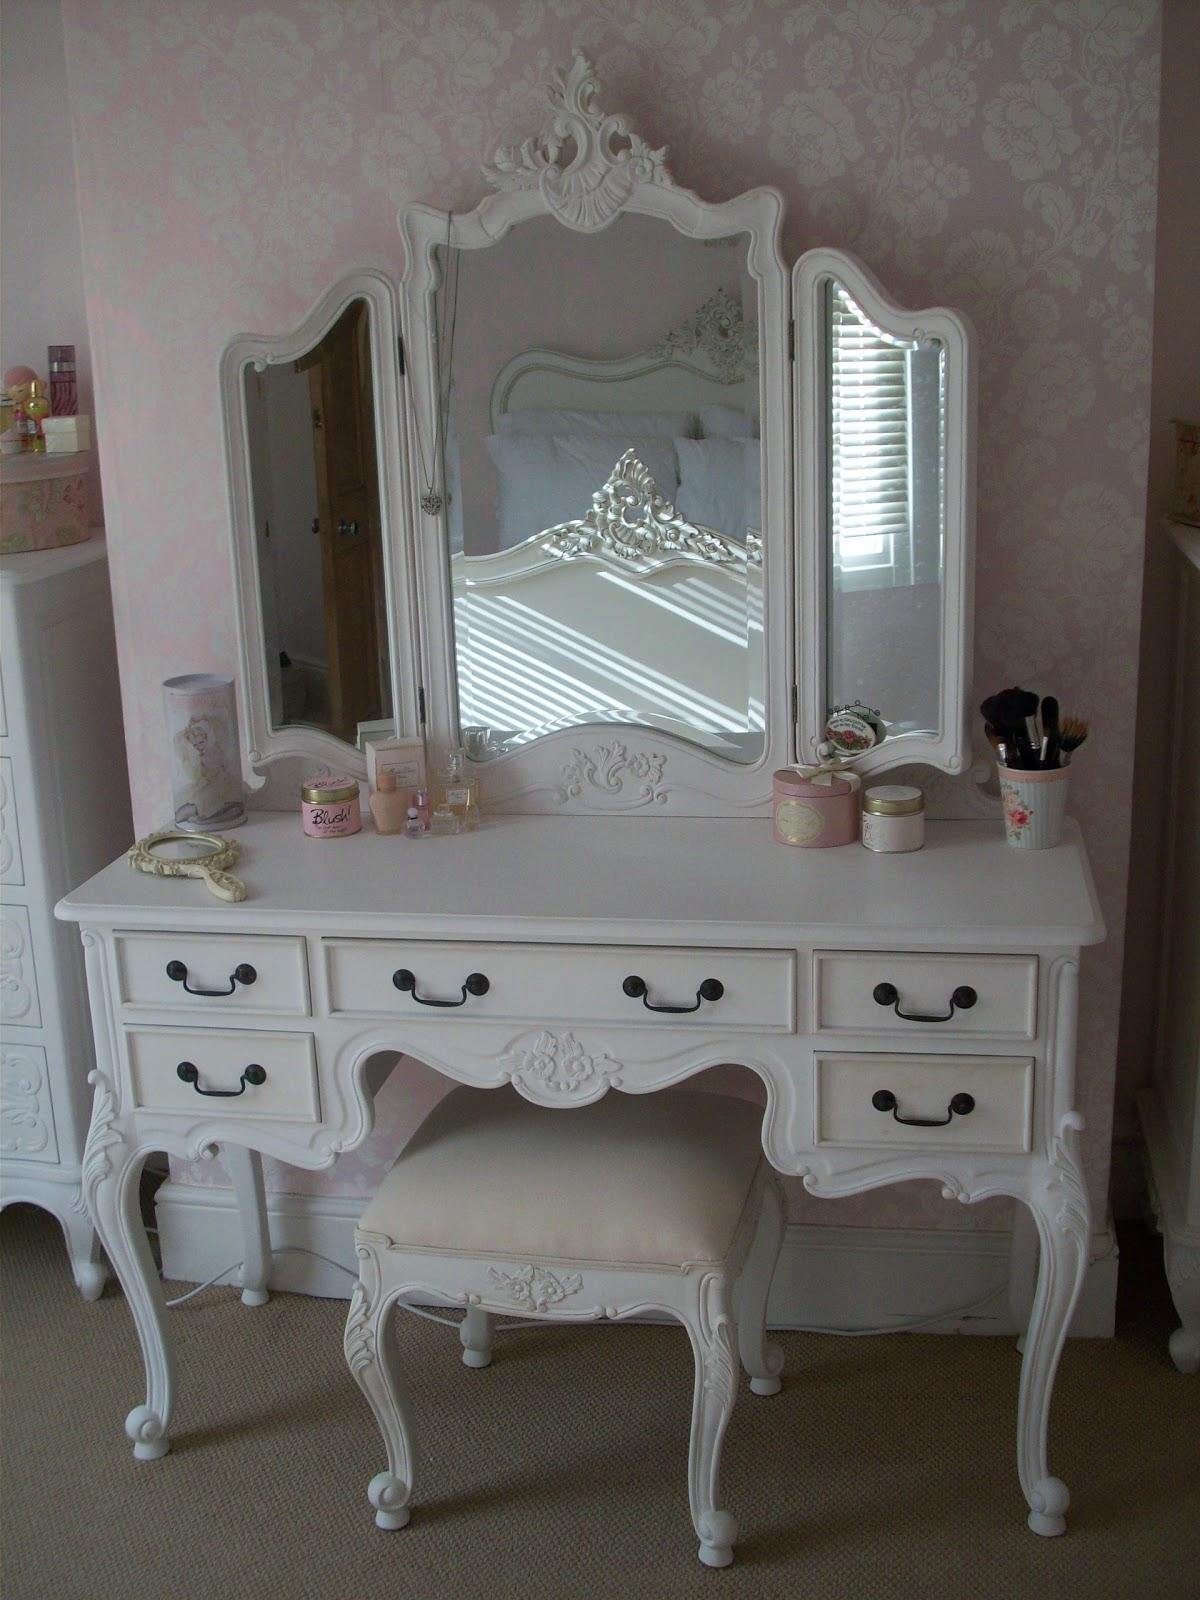 Shabby Chic White Makeup Vanity Set With Plenty Drawers And Tri Regarding Shabby Chic White Mirrors (Image 16 of 20)